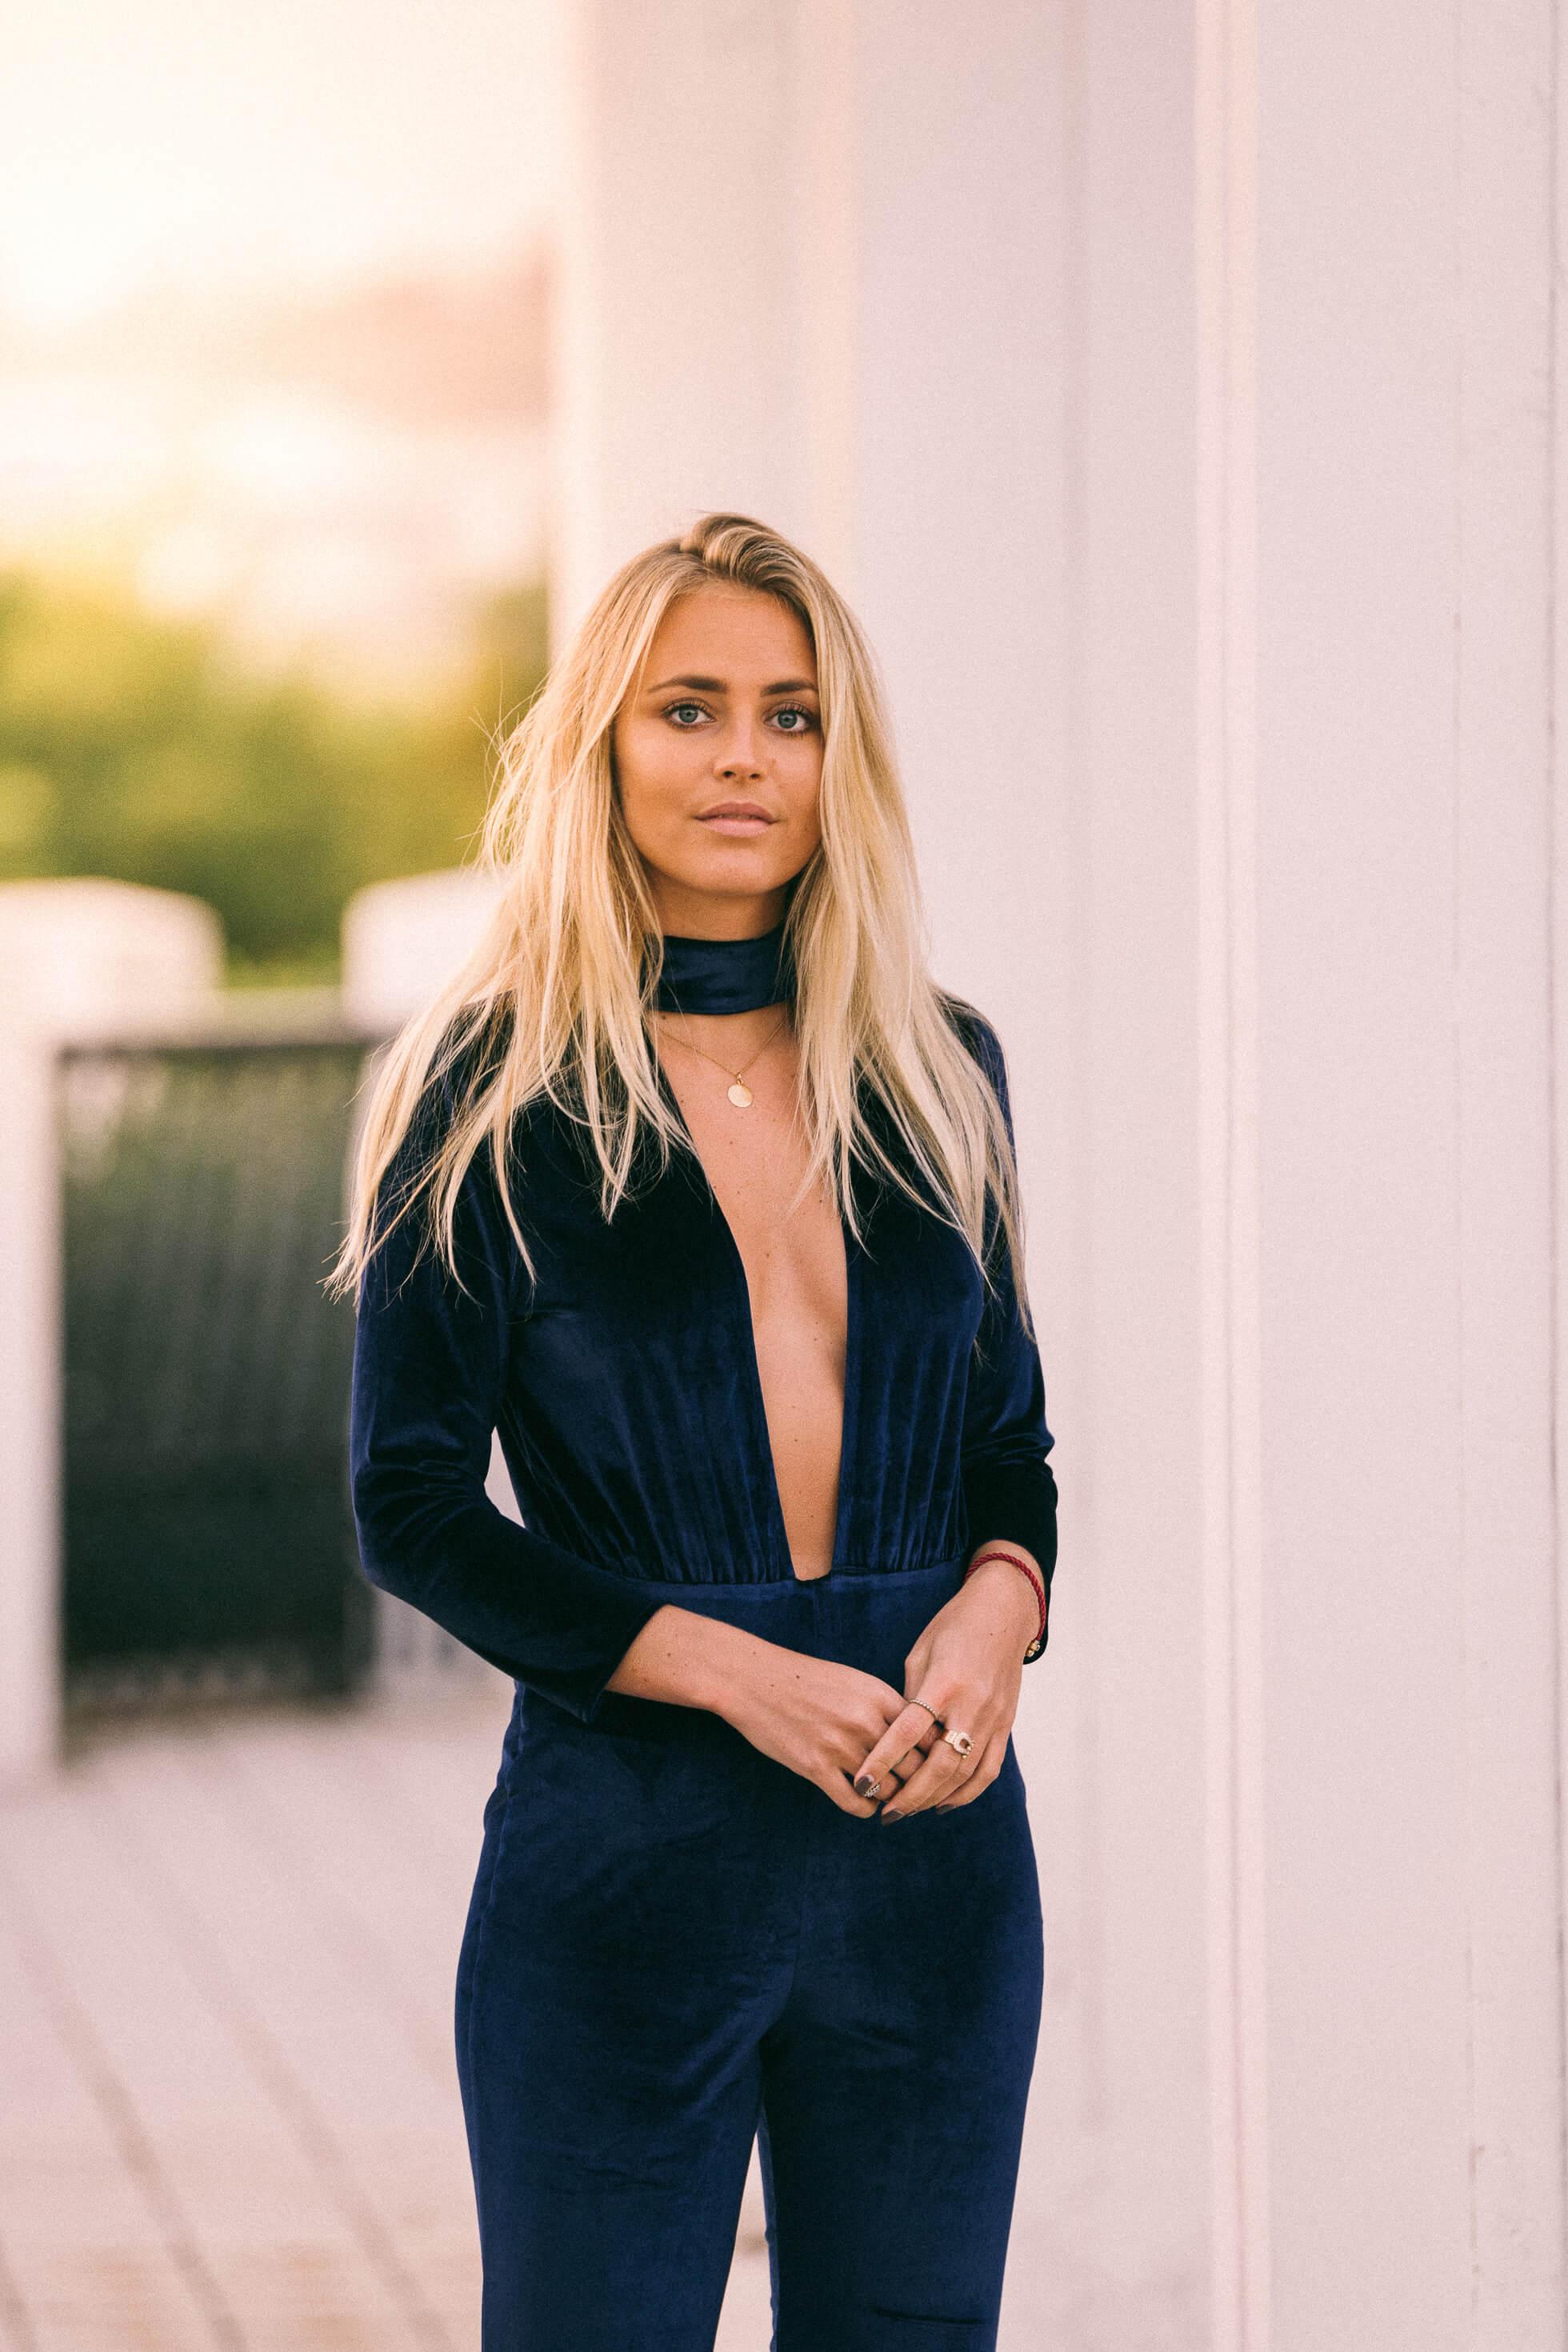 ICloud Mia Moretti nude photos 2019